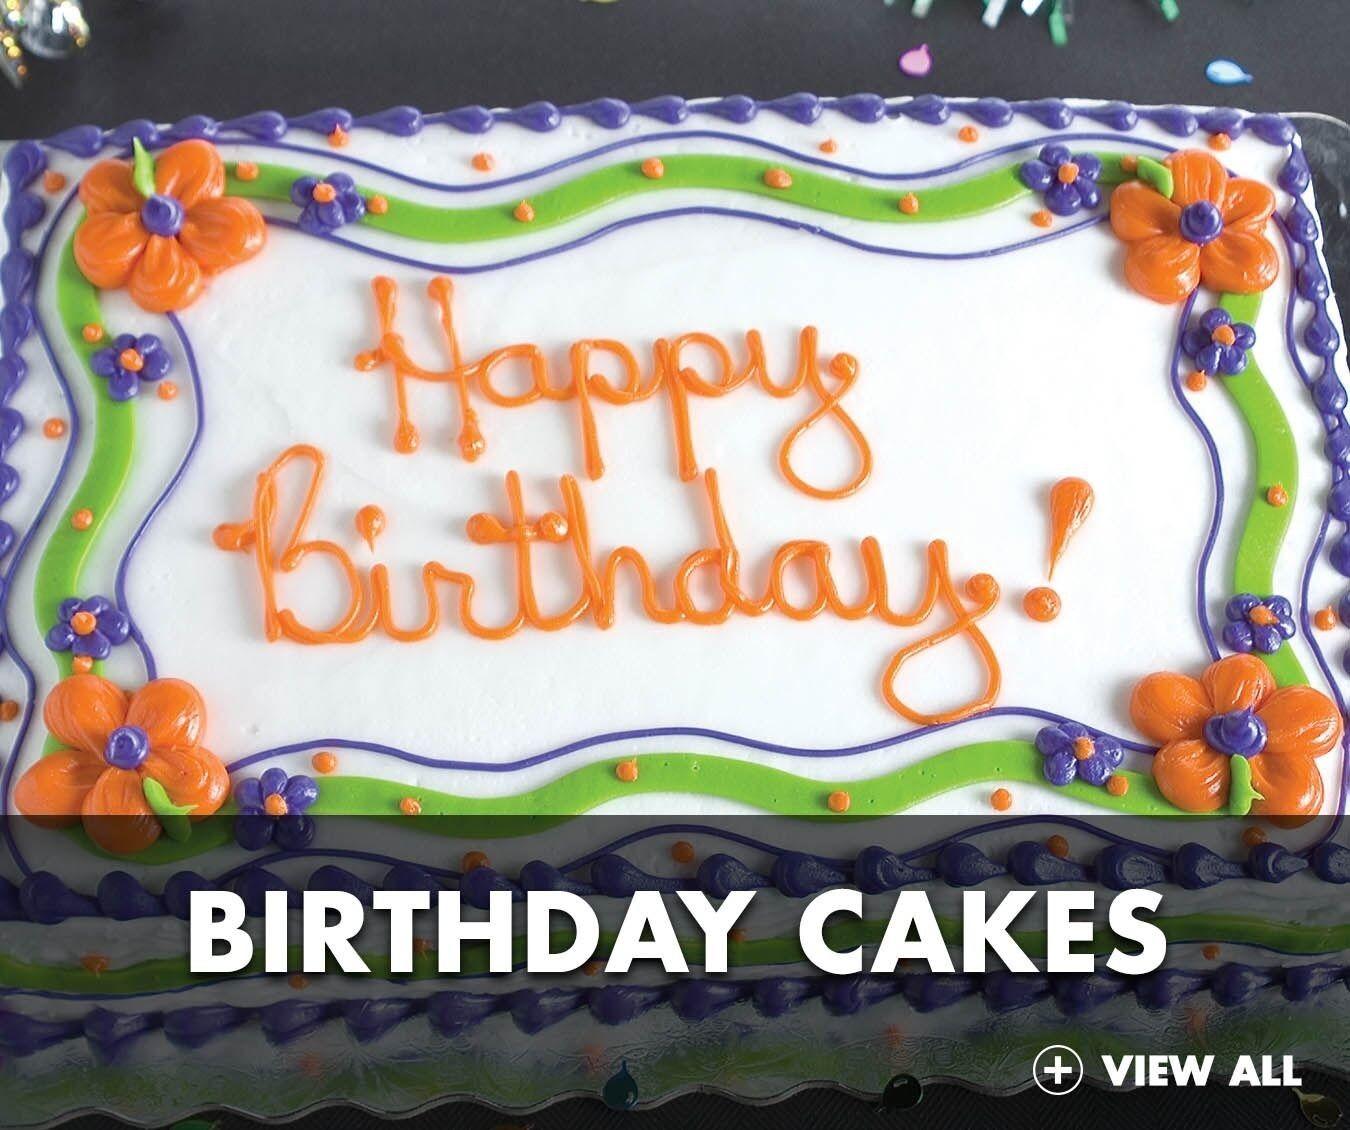 Food lion birthday cake designs di 2020